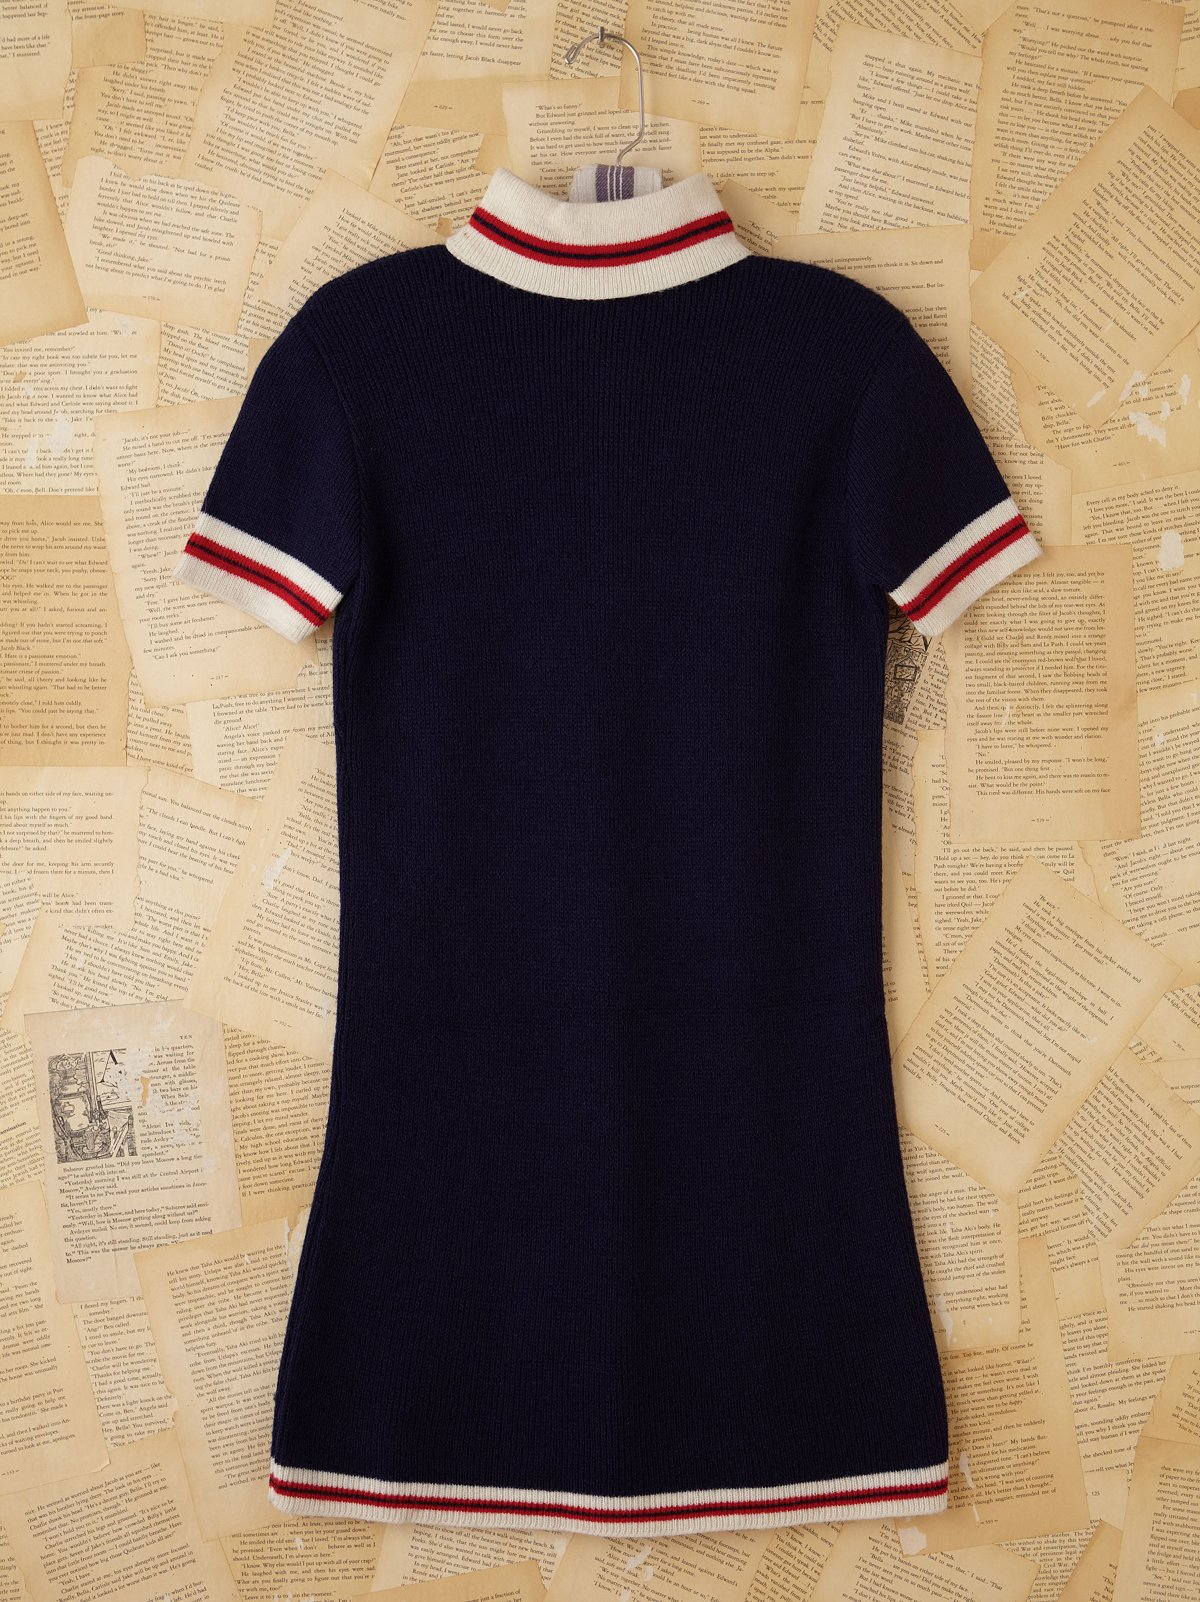 Vintage Sporty Sweater Dress